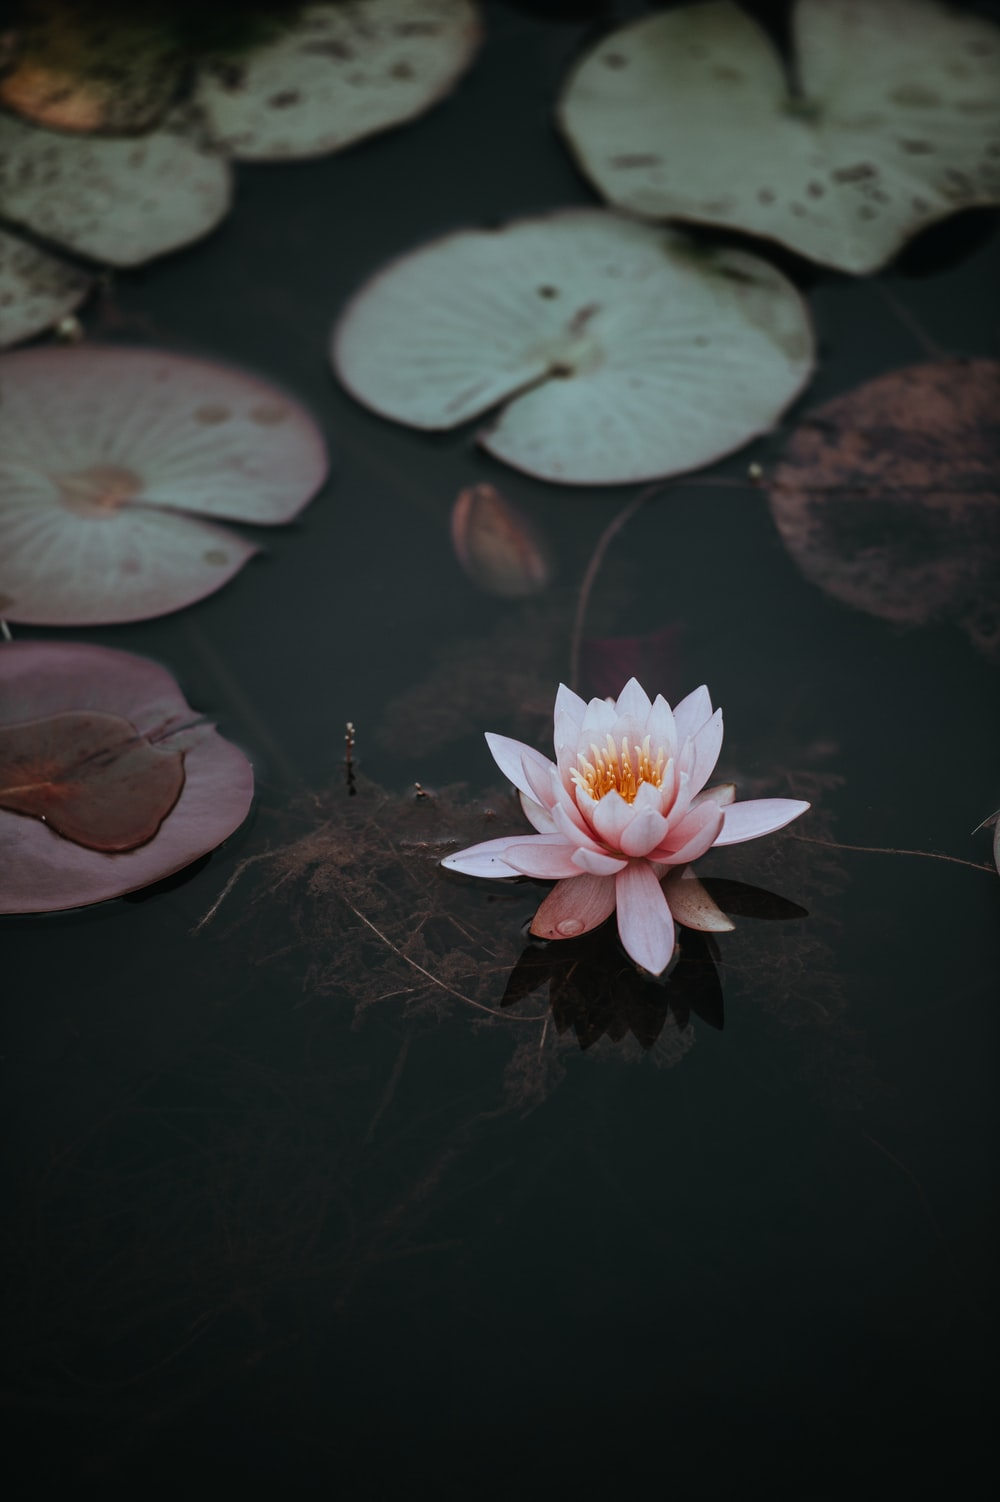 Lily pad photo by annie spratt anniespratt on unsplash pink lotus flower on clear body of water izmirmasajfo